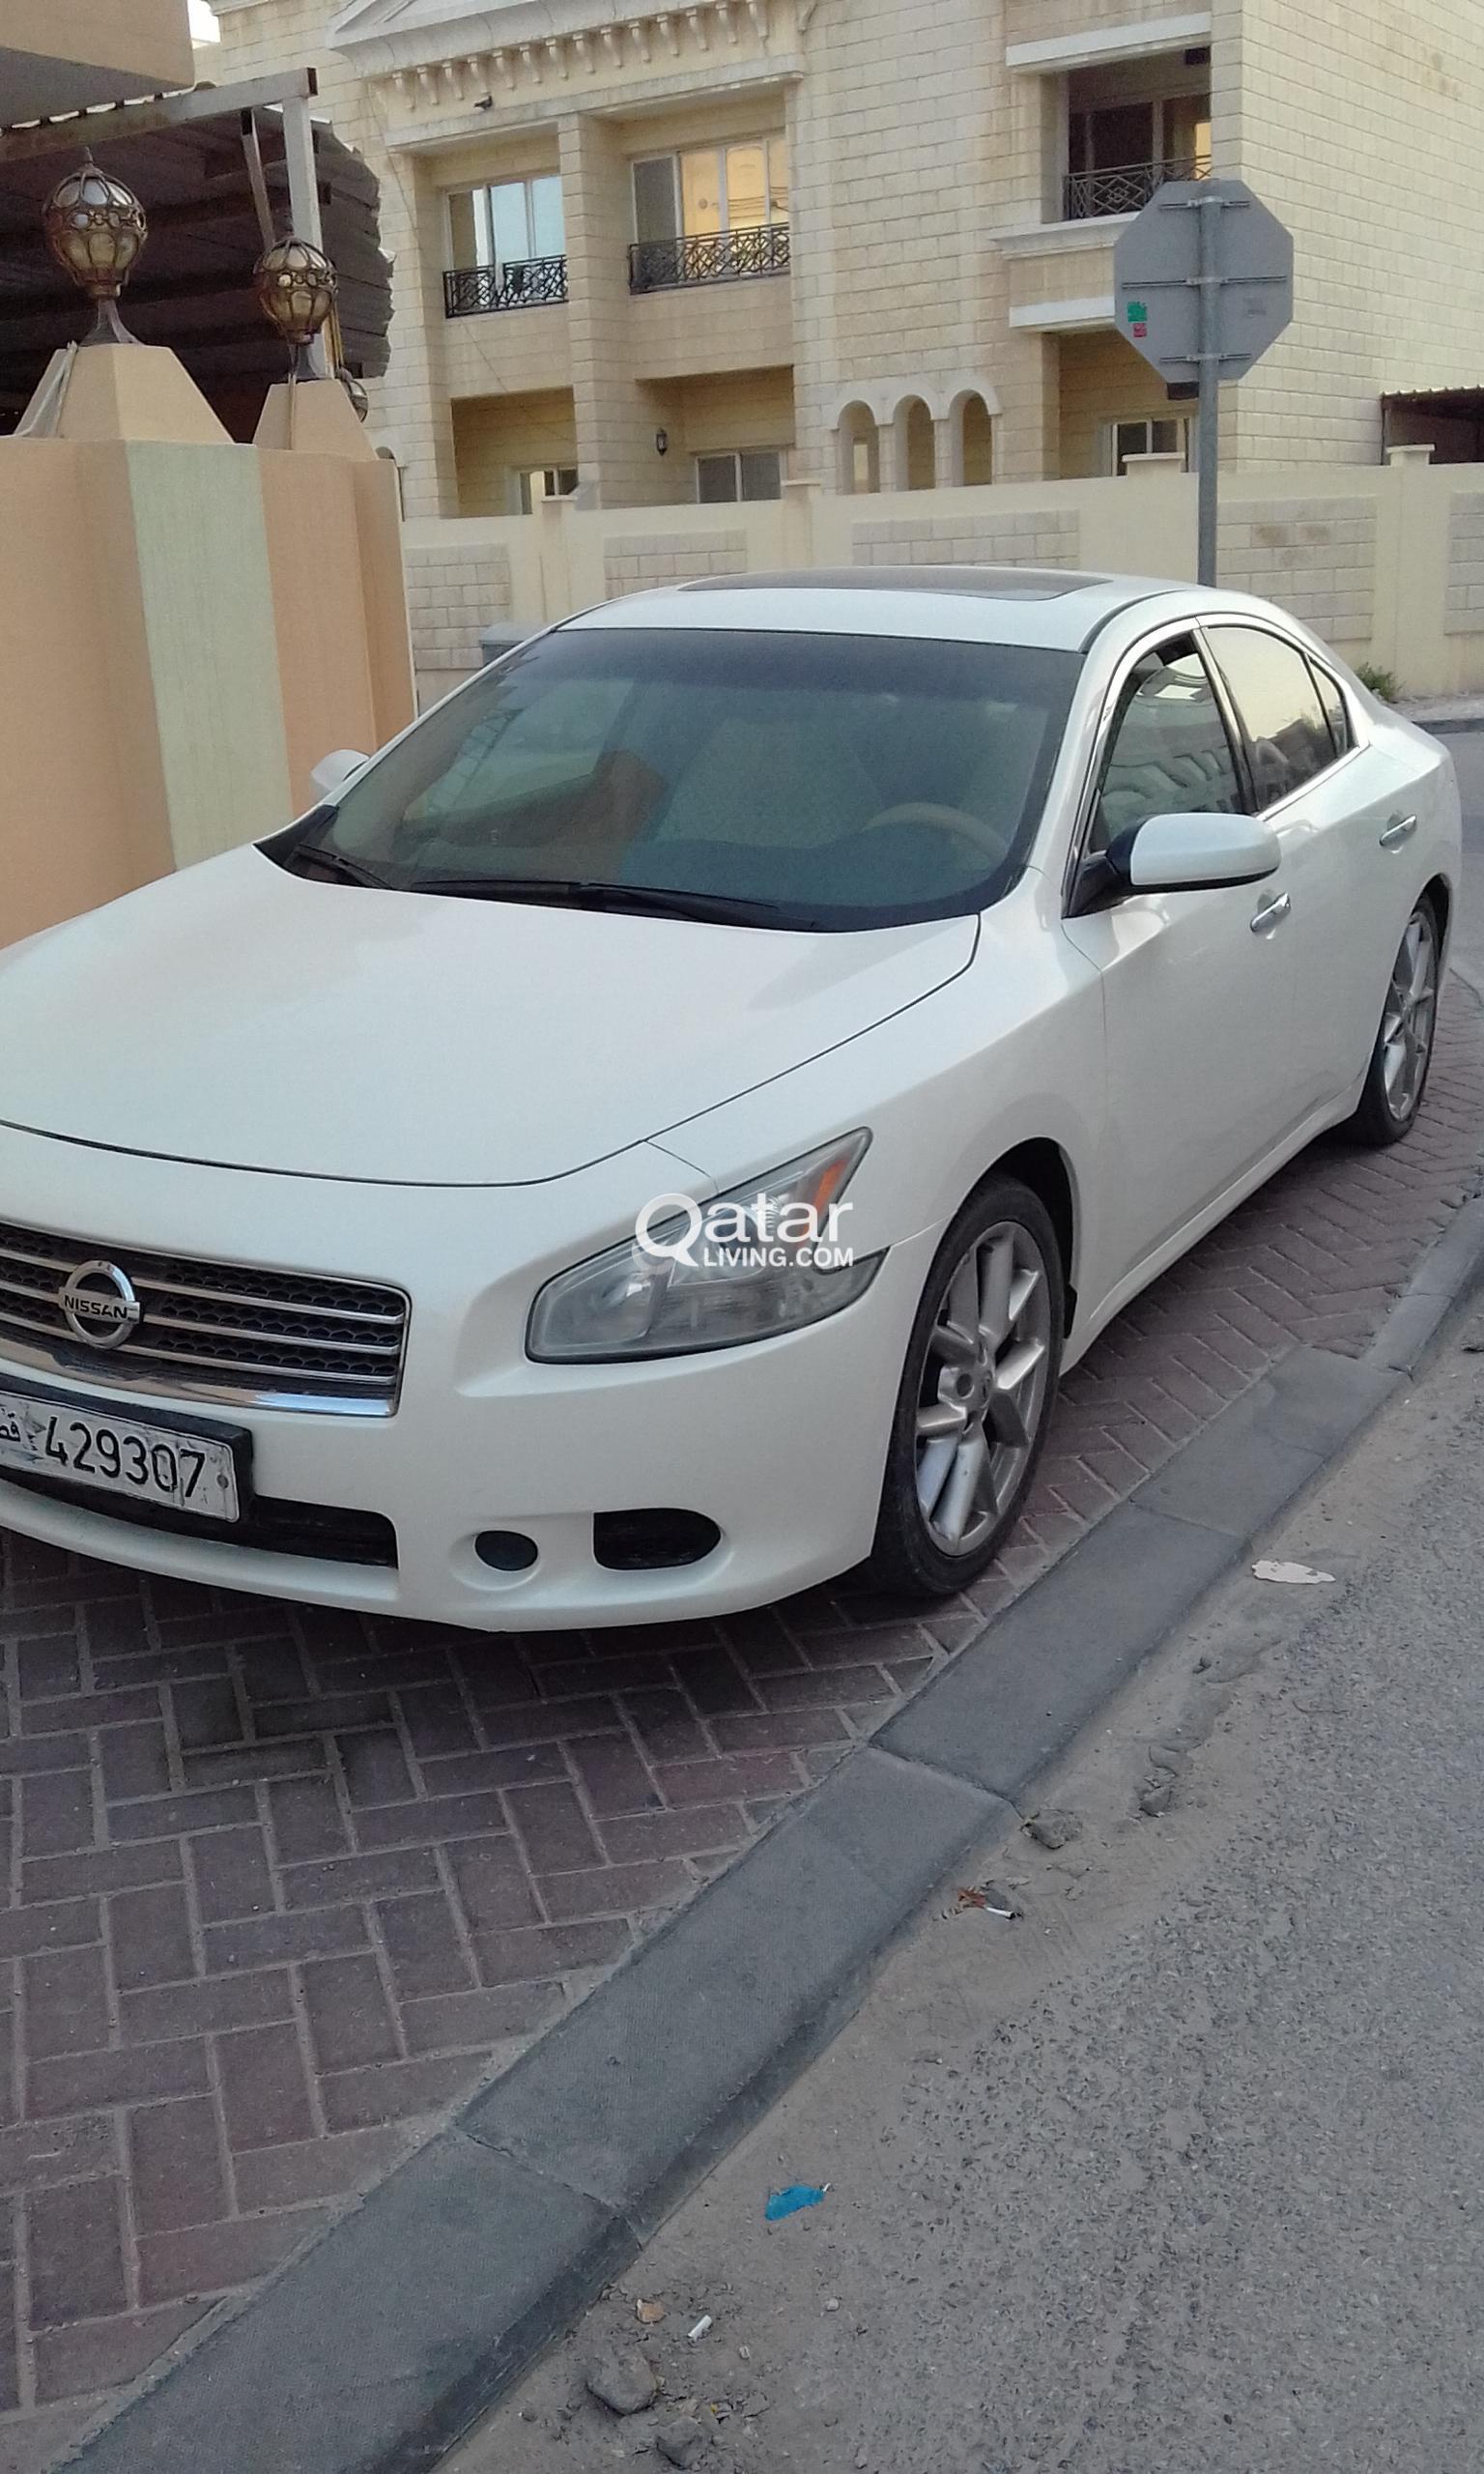 ... Title · Title · Title · Title. Information. For Sale Nissan Maxima  Model 2010 ...